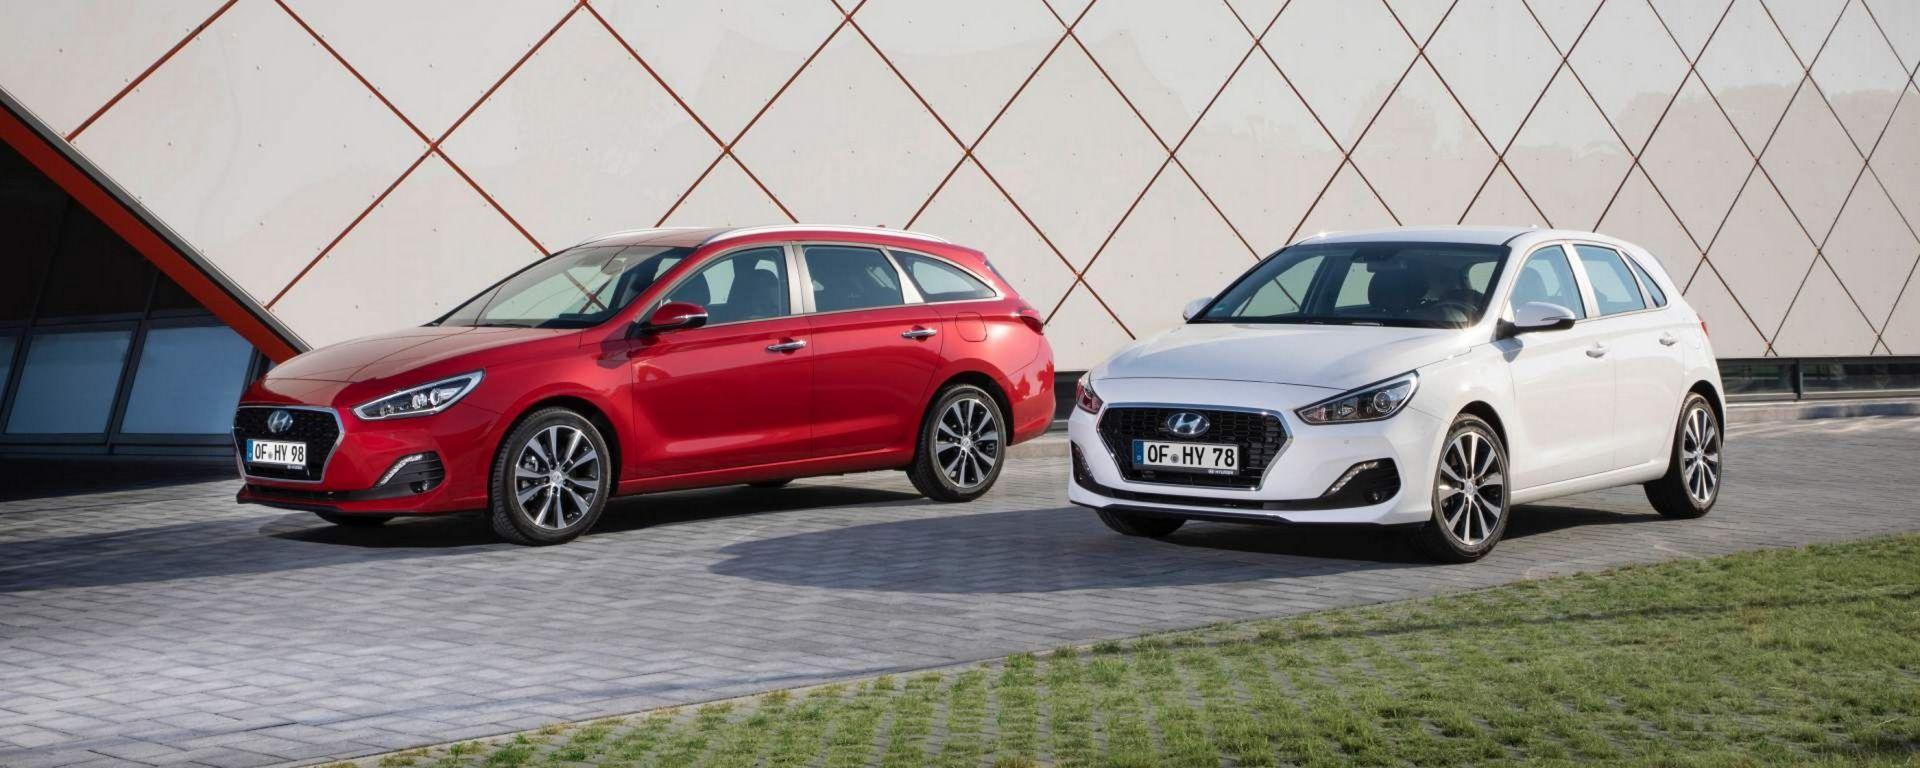 Hyundai i30 MY19: motori e infotainment si aggiornano